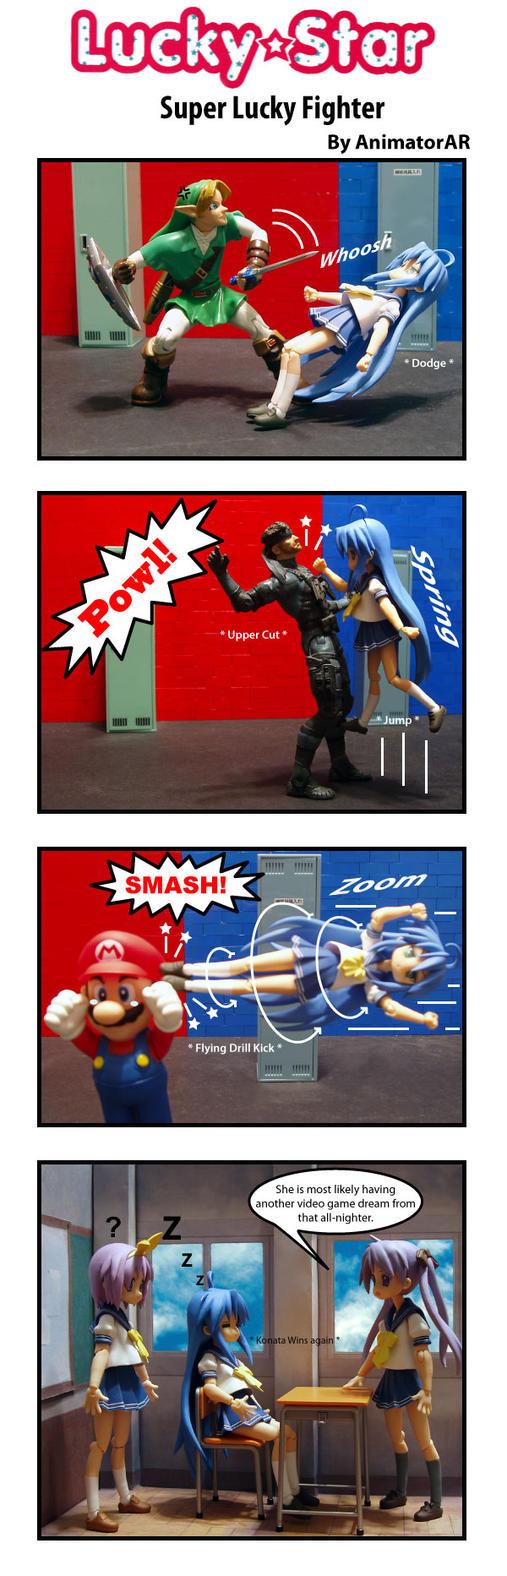 Super Lucky Fighter by AnimatorAR